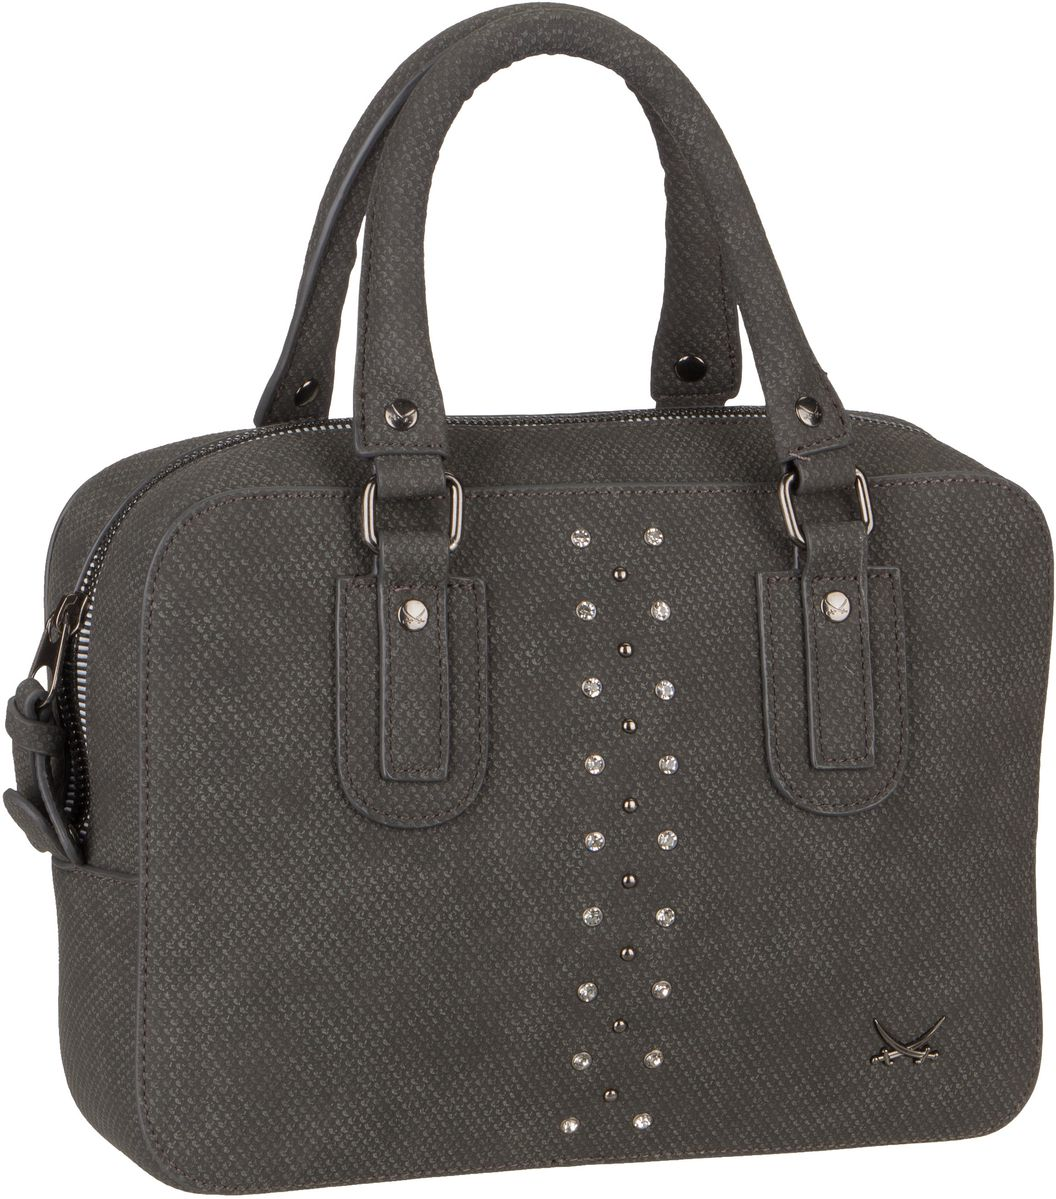 Handtasche Bowling Bag 1320 Anthracite